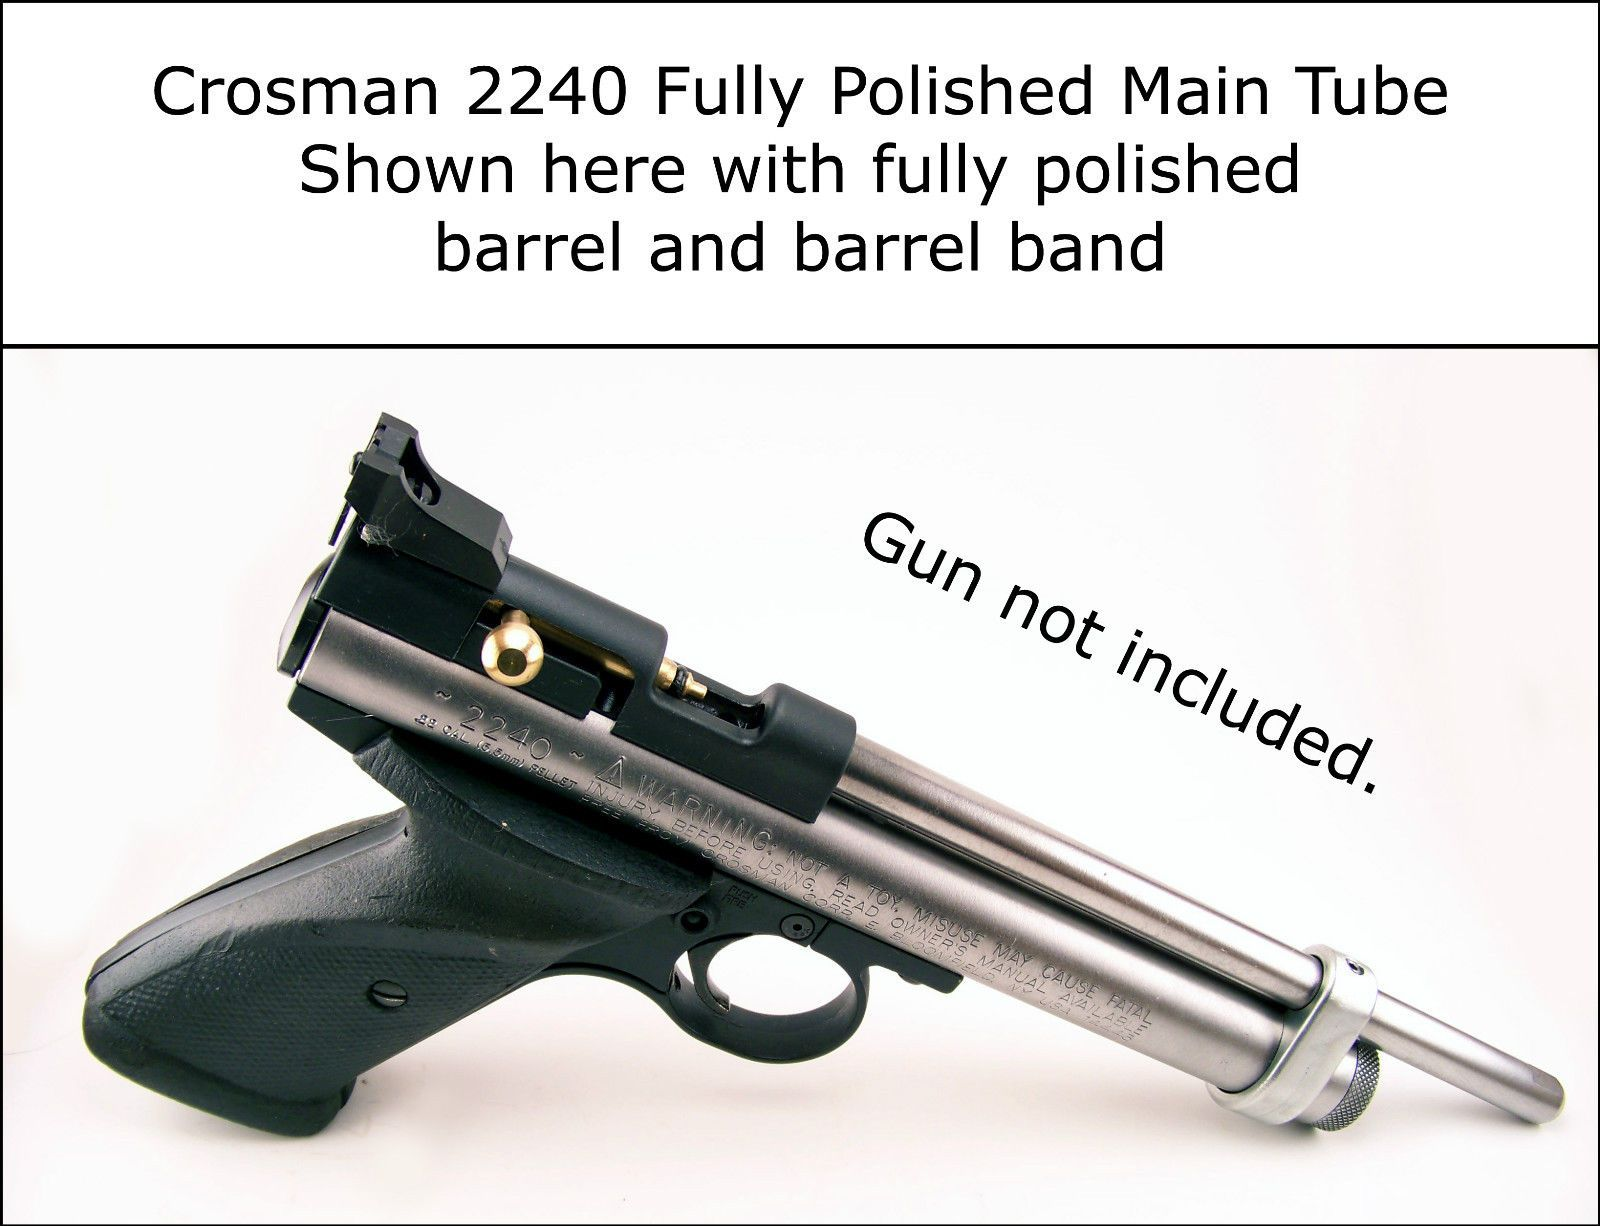 crosman 2240 fully polished co2 gas main tube upgrade like rh pinterest com 2240 Crosman Air Pistols Parts 2240 Crosman Air Pistols Parts